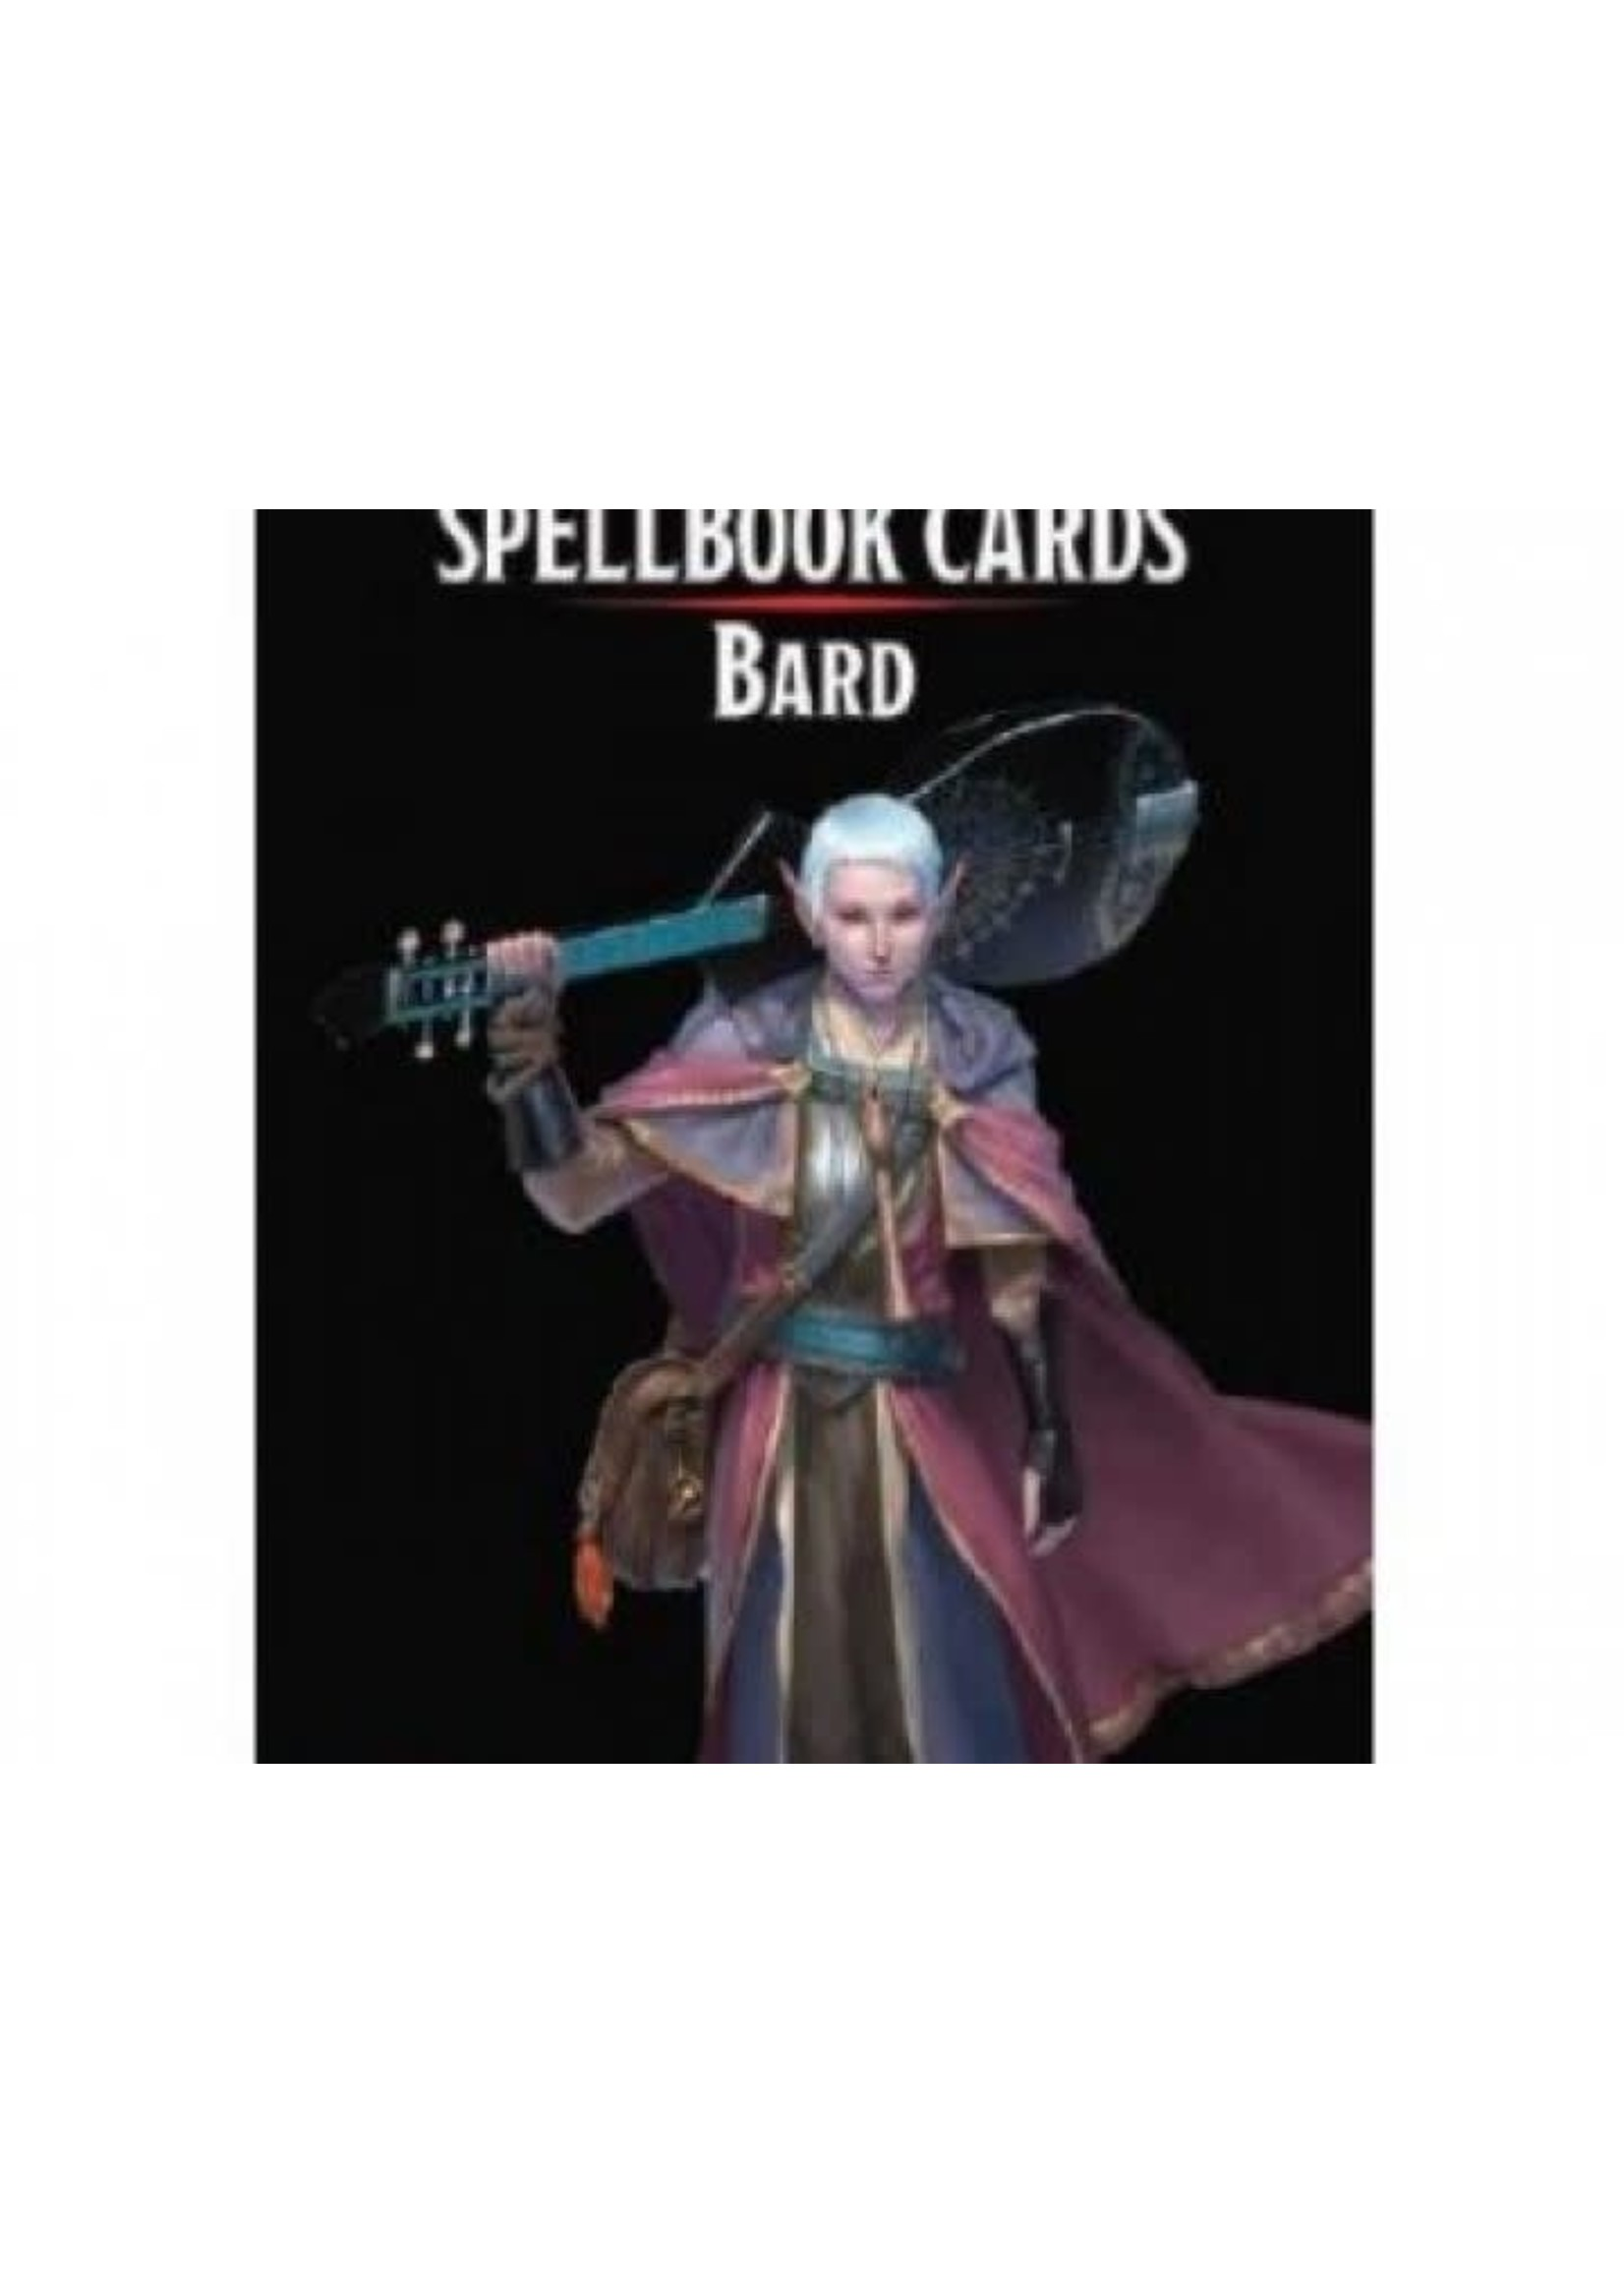 D&D Spellbook Cards Bard